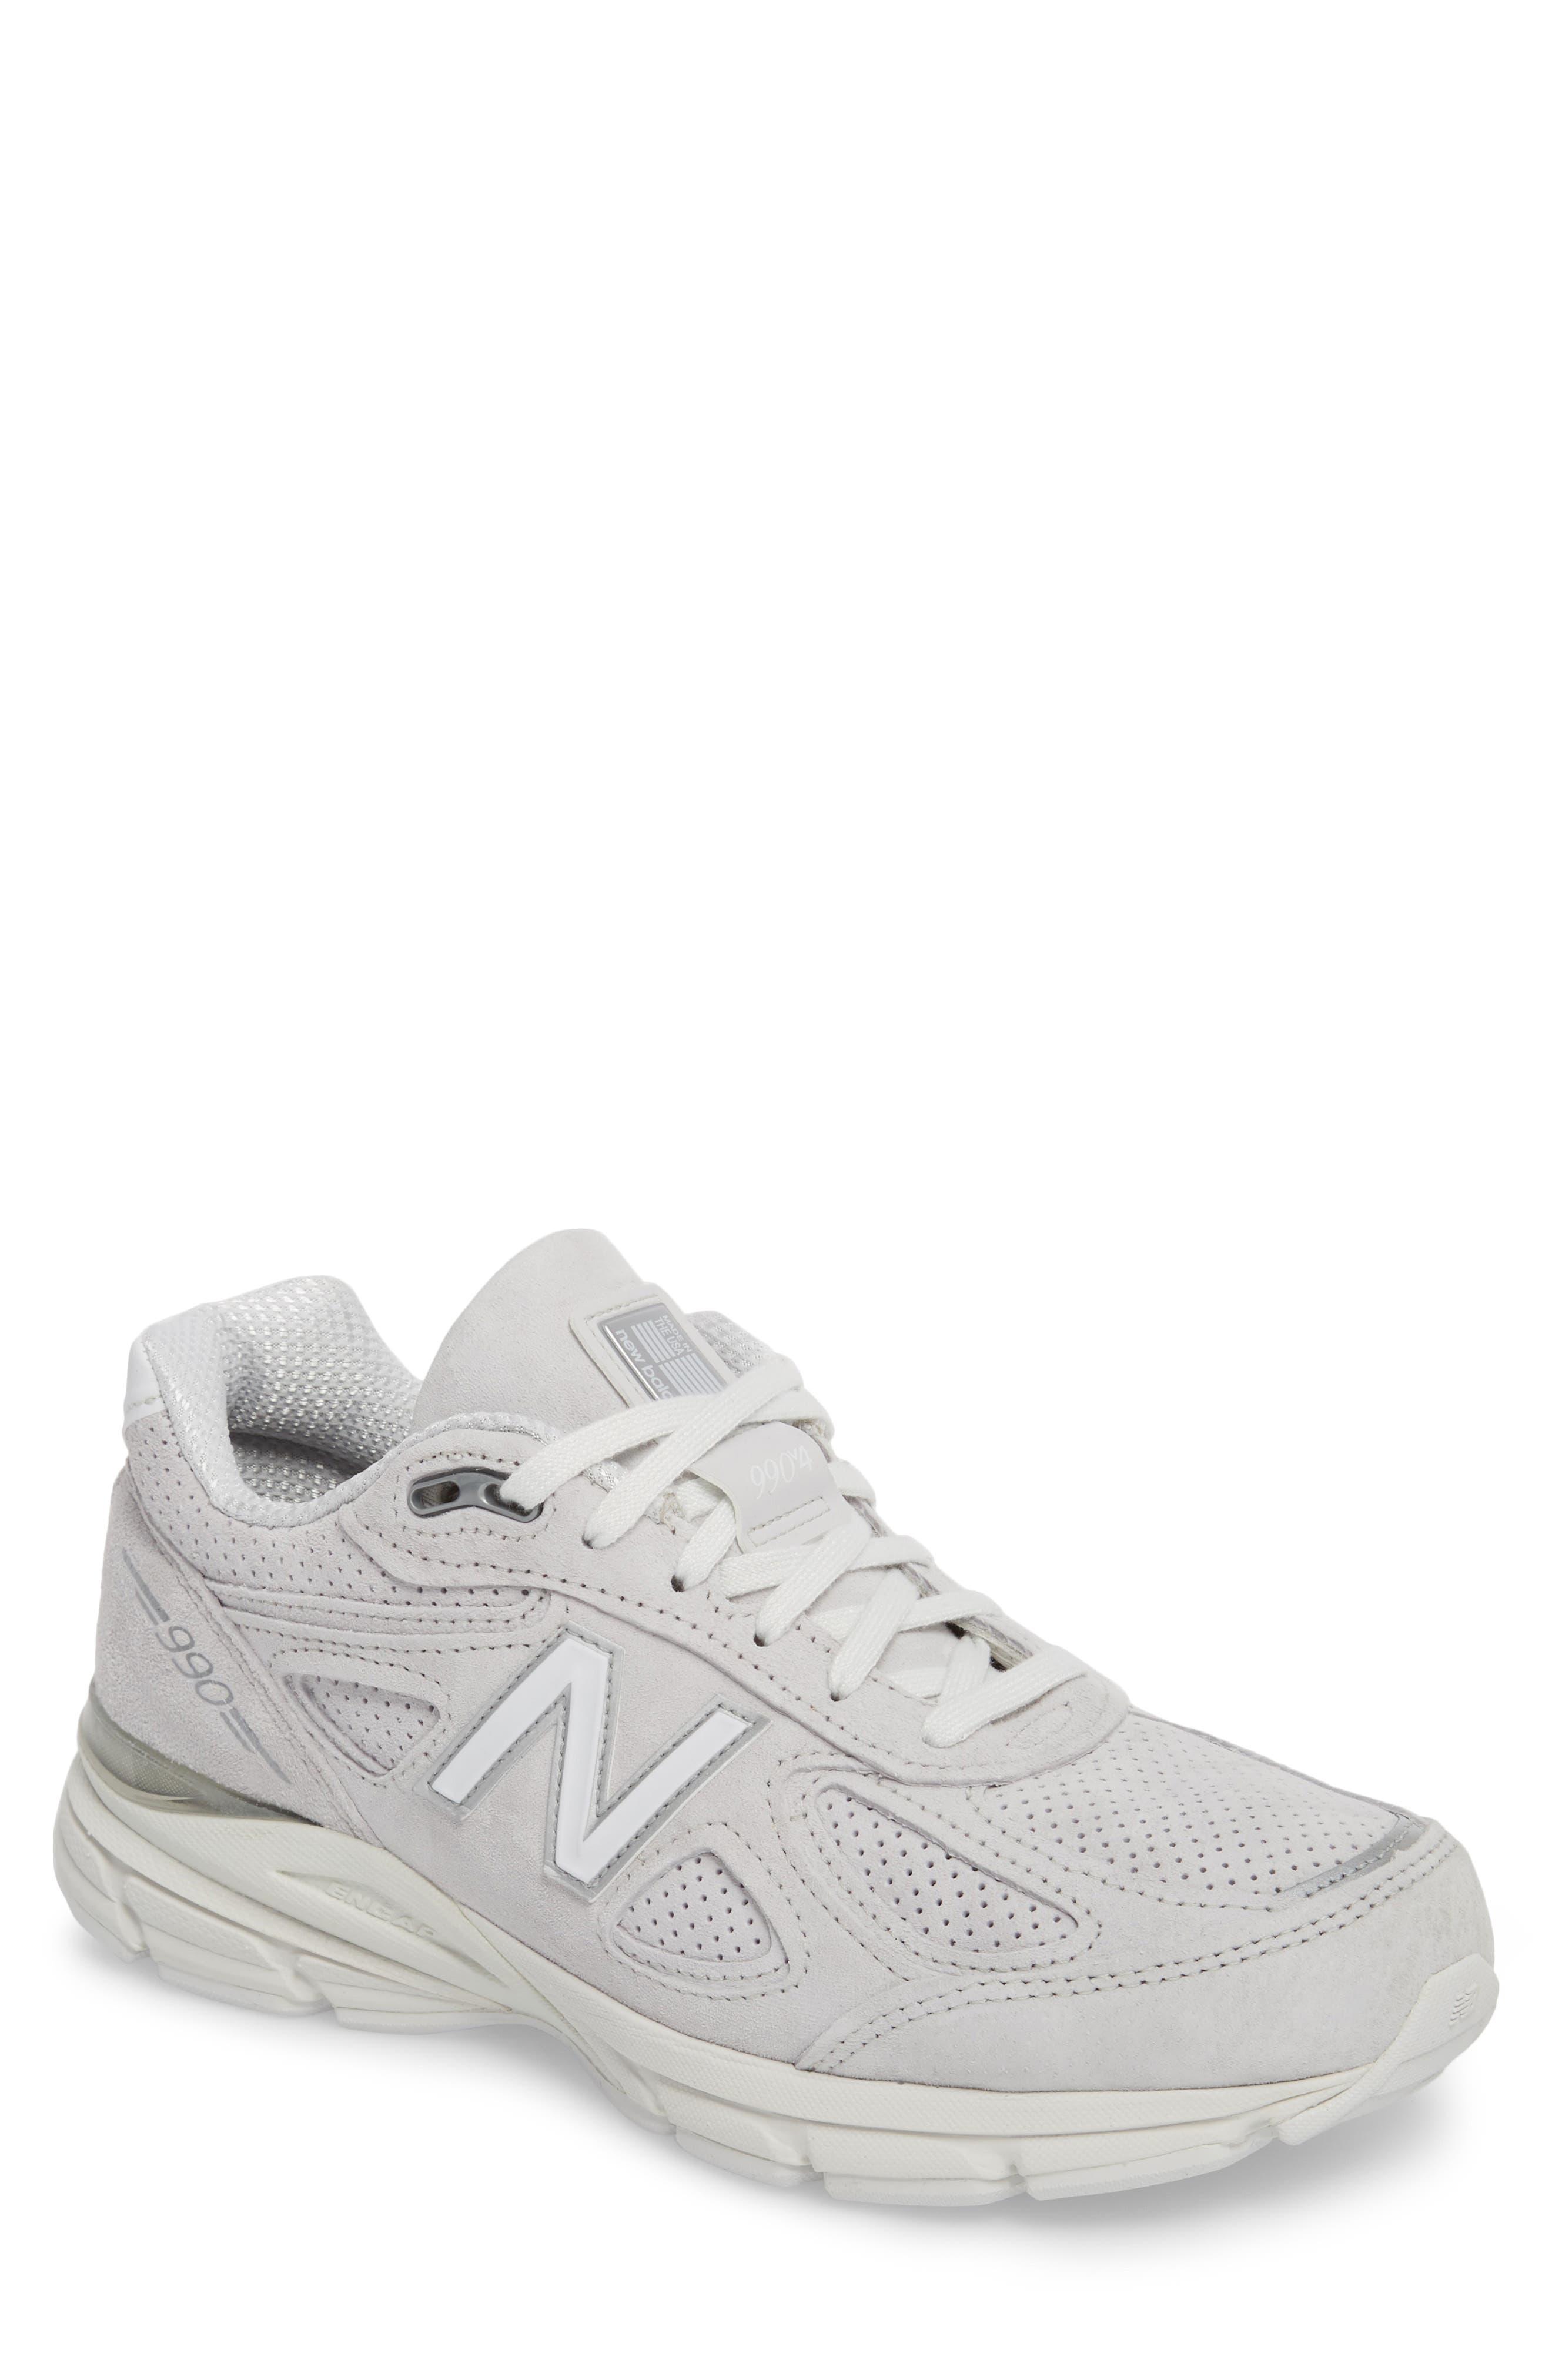 990v4 Perforated Sneaker,                             Main thumbnail 1, color,                             034